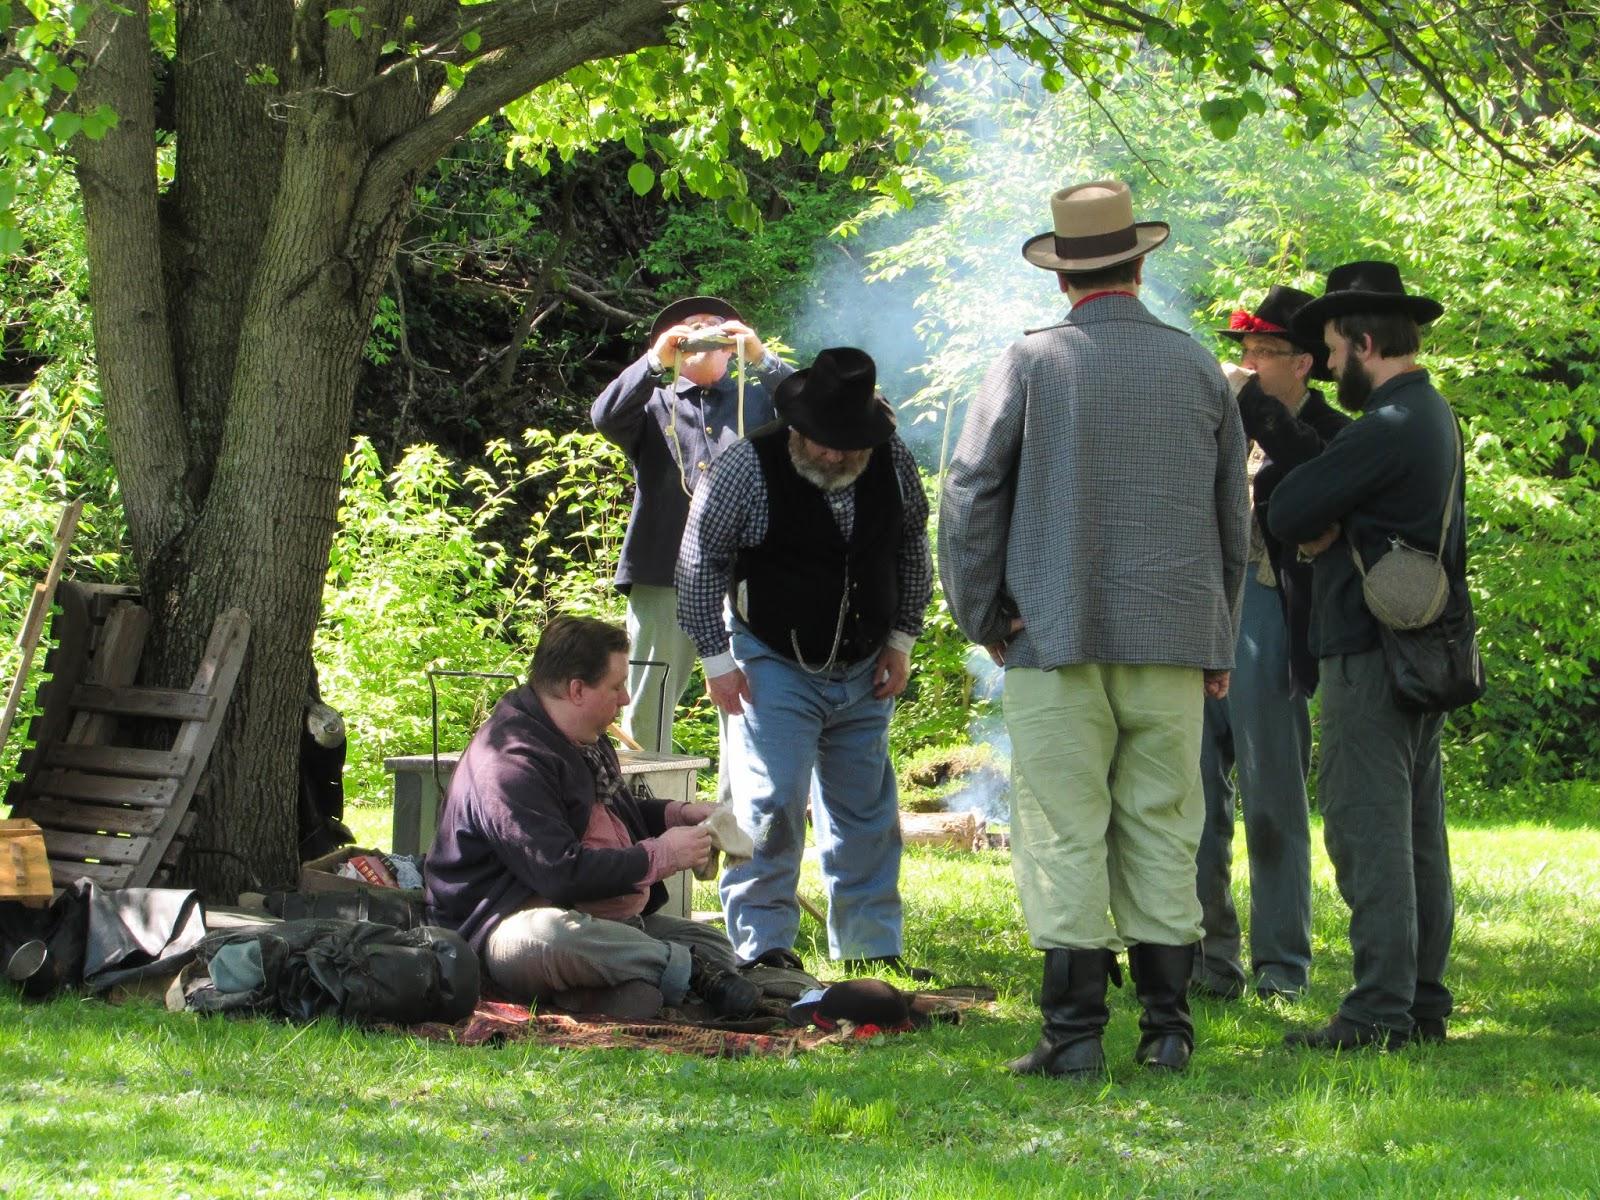 Romantic History: Grant Days at Ulysses Grants Boyhood Home